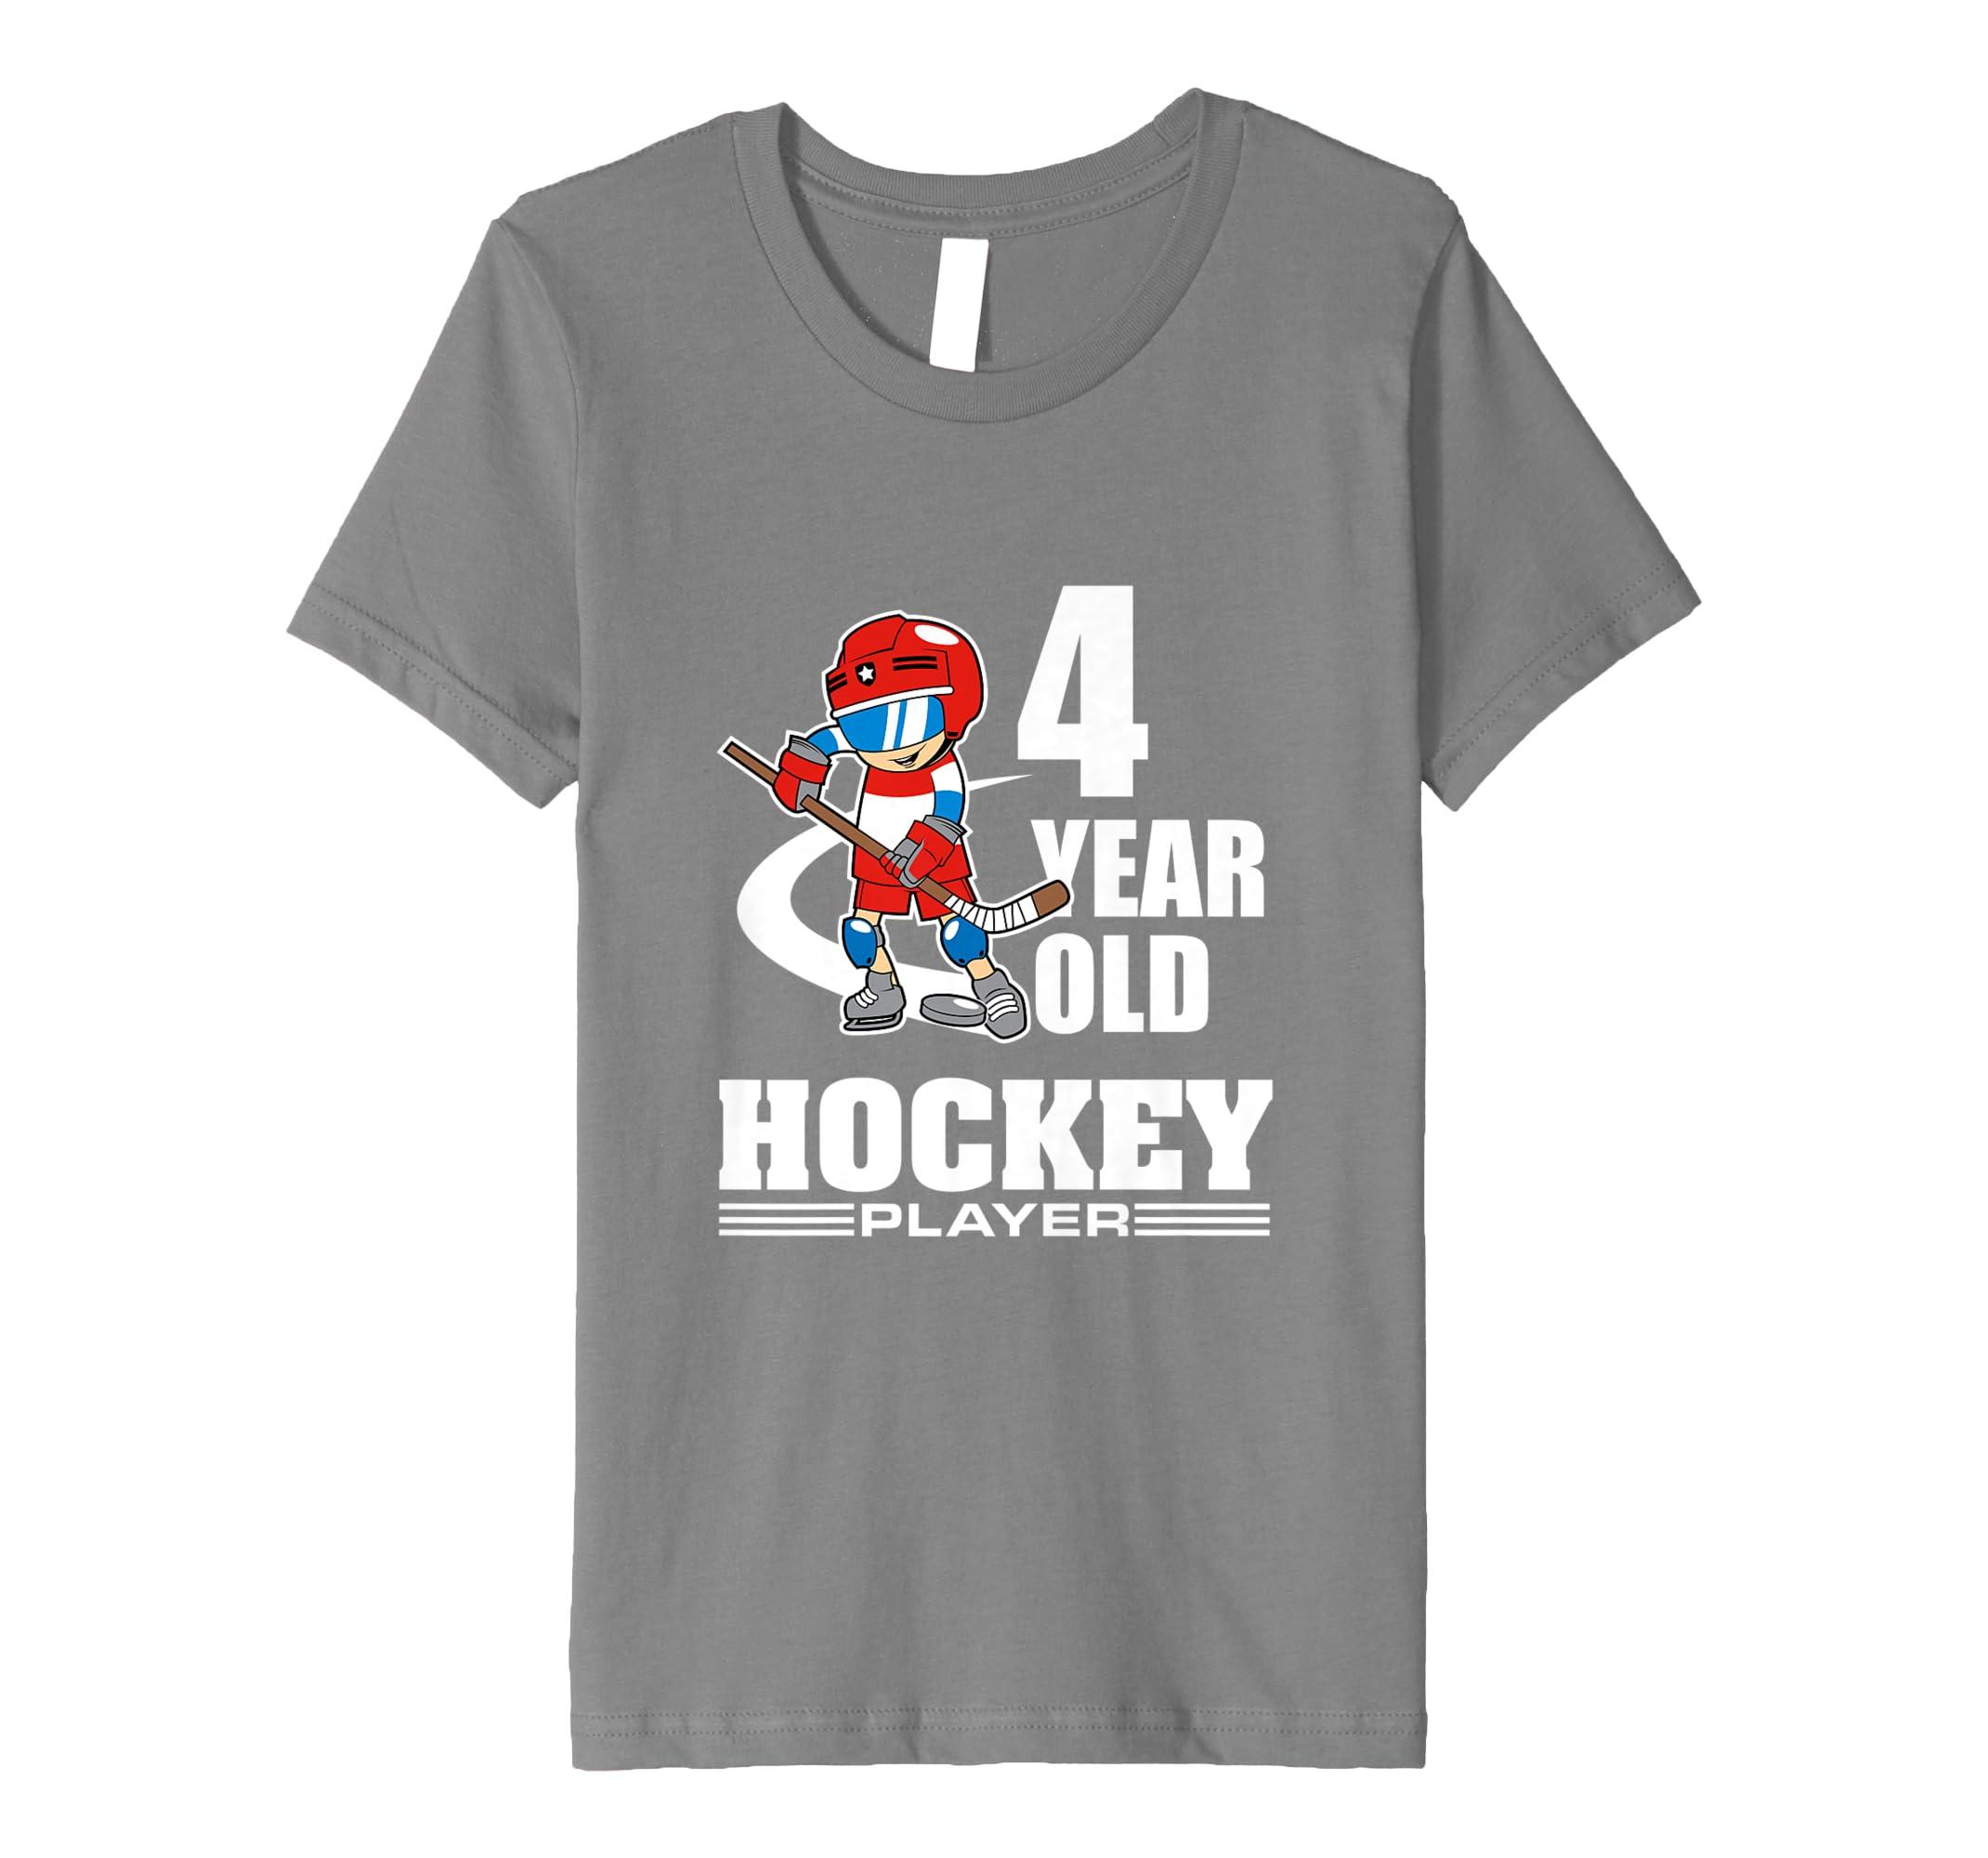 f7a195b6a23d0 Amazon.com: Kids Hockey T-Shirt - 4 Year Old Hockey Player Birthday ...